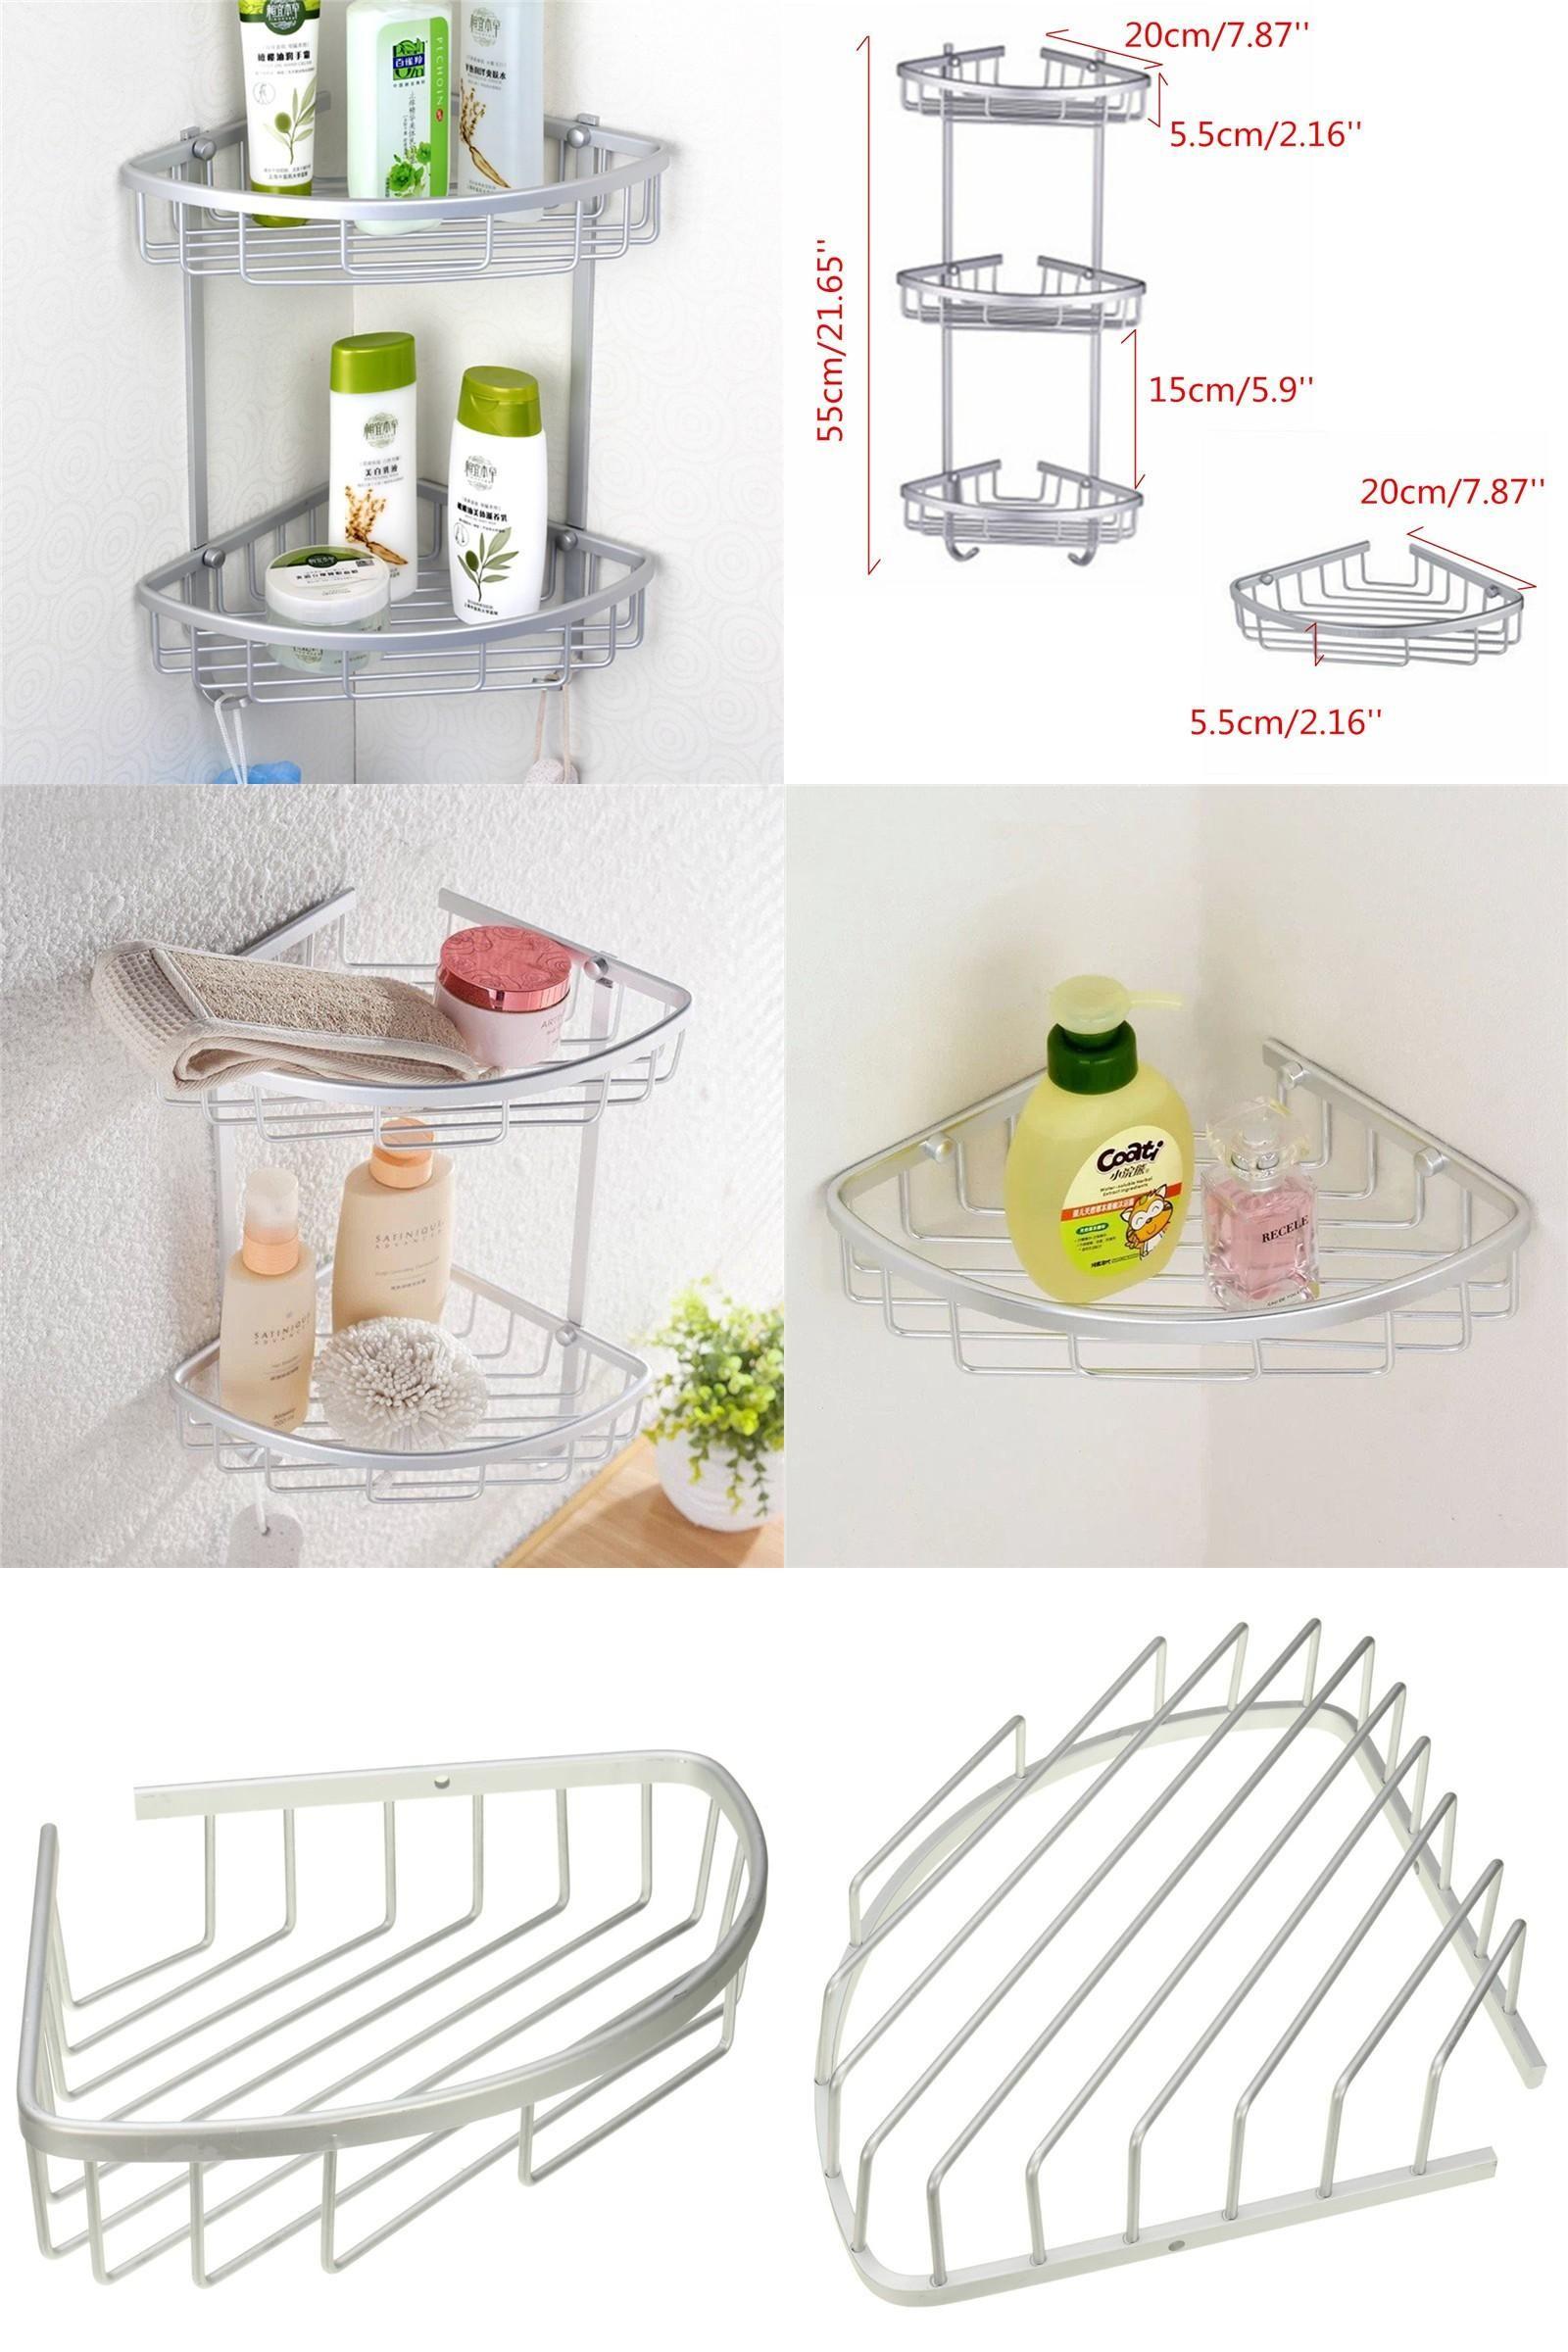 Visit To Buy Antique Space Aluminum Corner Basket Bathroom Products Luxury Cosmetic Stora Bathroom Shower Accessories Corner Storage Shelves Bathroom Shelves